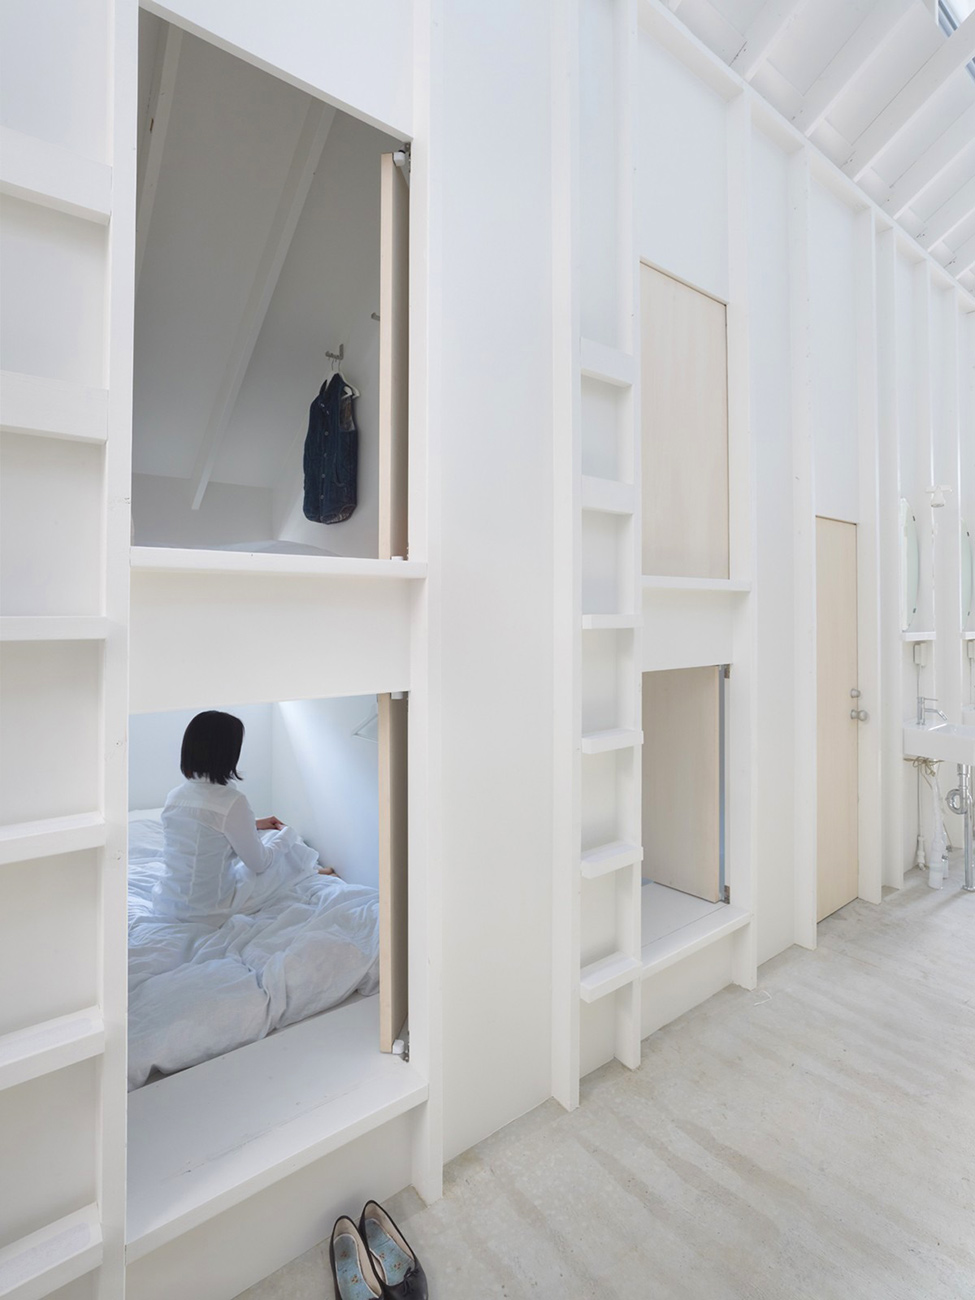 koyasan_guest_house_hqroom_ru_16